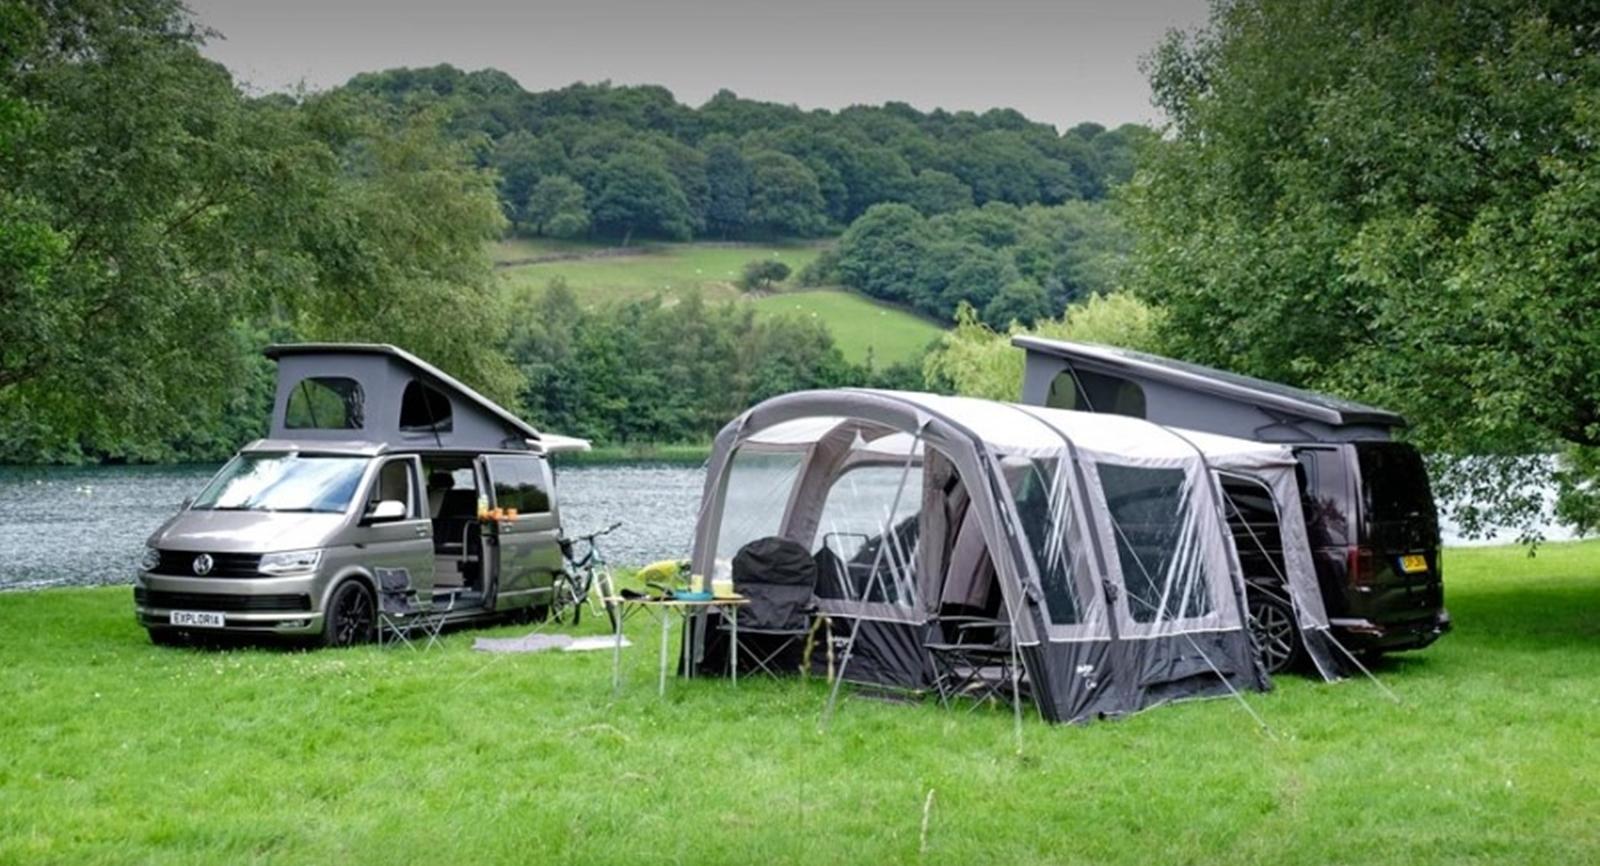 Motorhome & Campervan Driveaway Awnings OBI Camping & Leisure